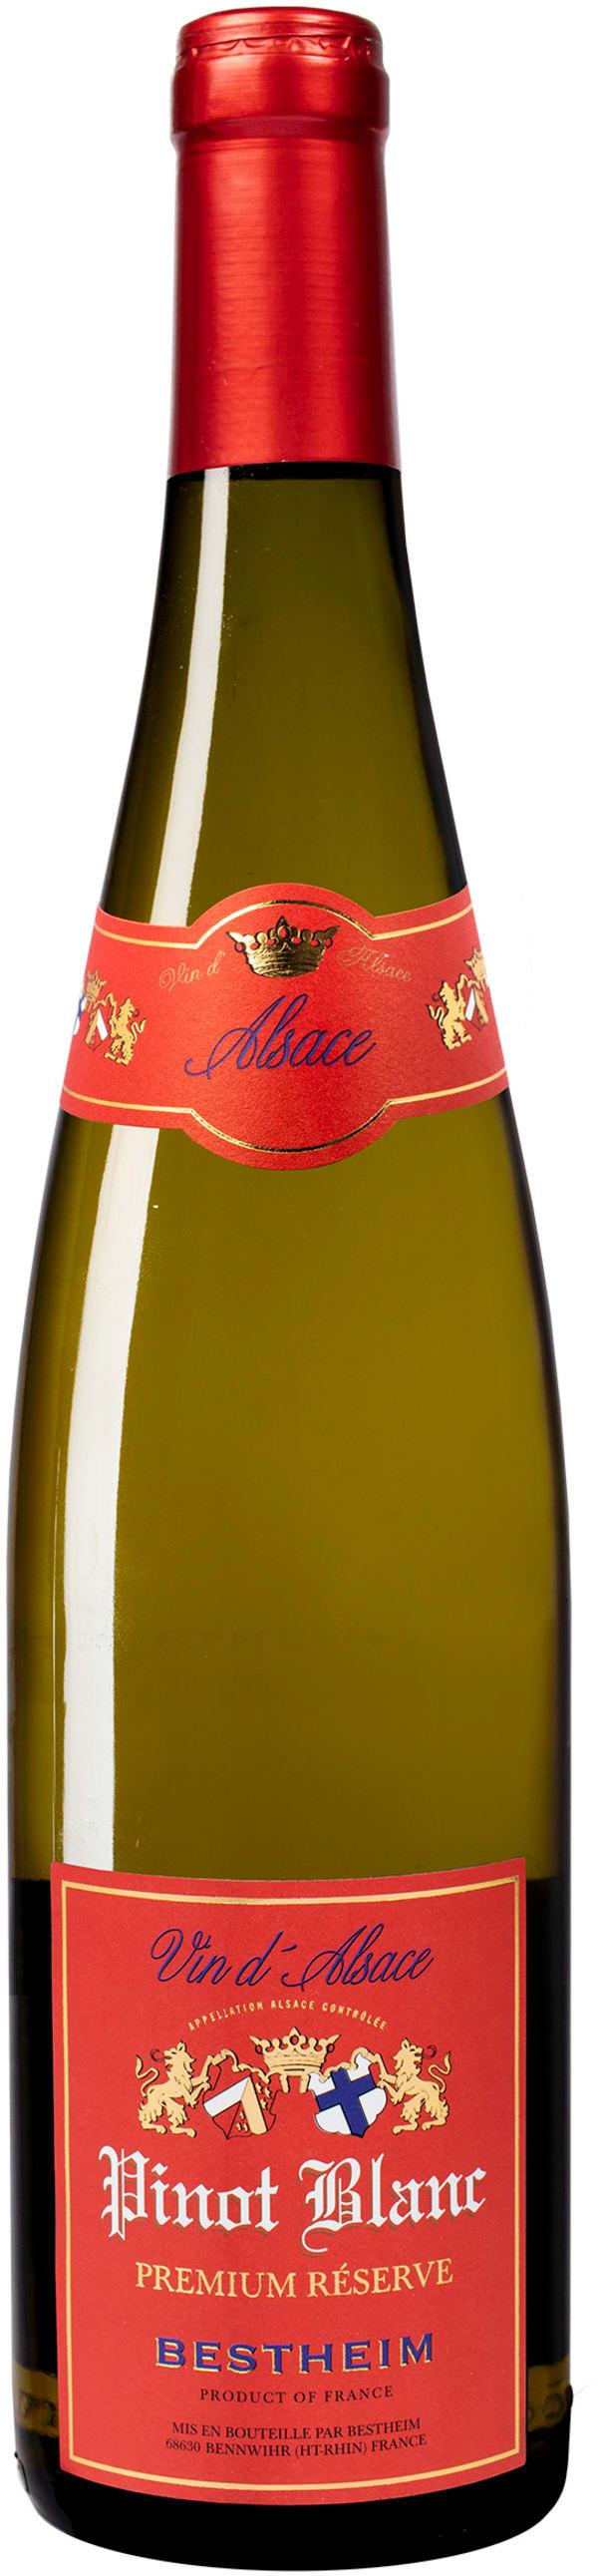 Bestheim Pinot Blanc Premium Réserve 2017